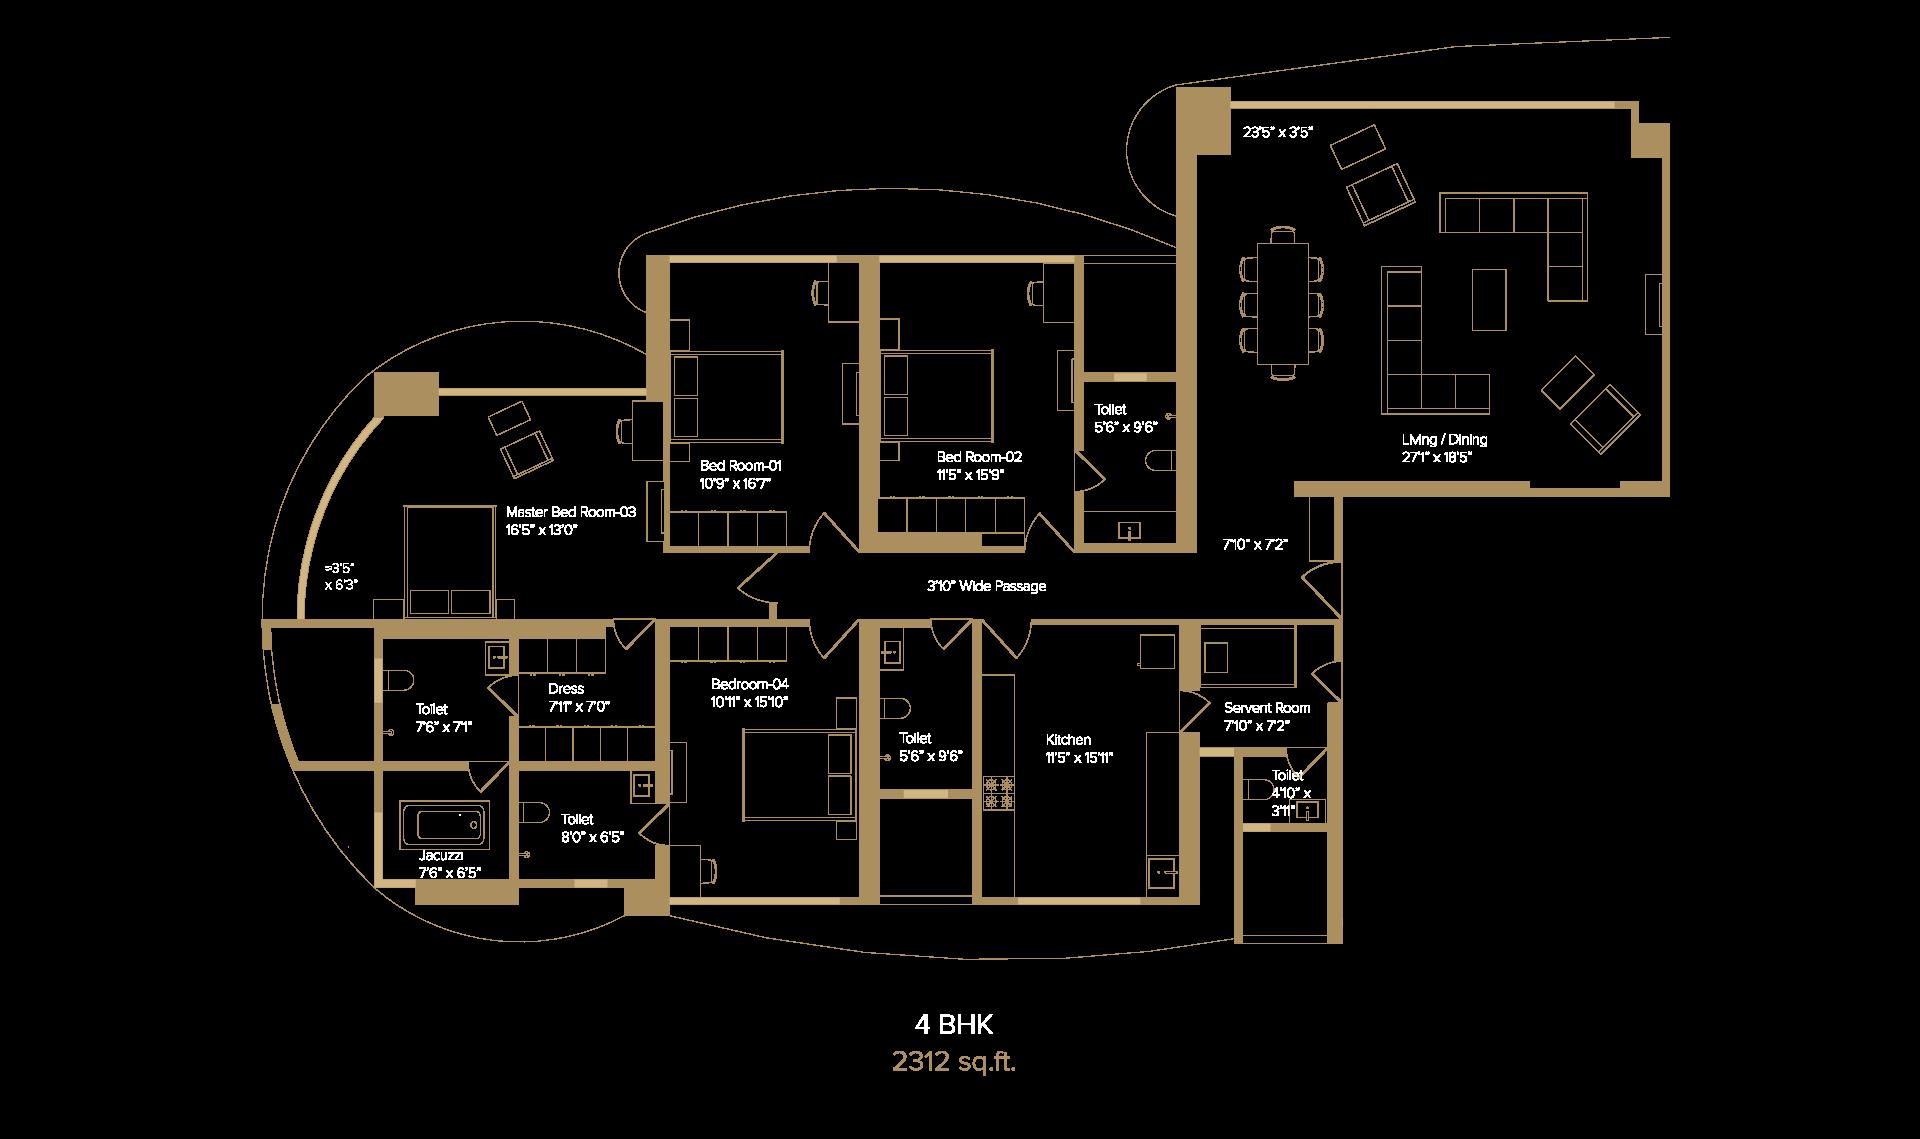 Monte Carlo 4BHK floorplan